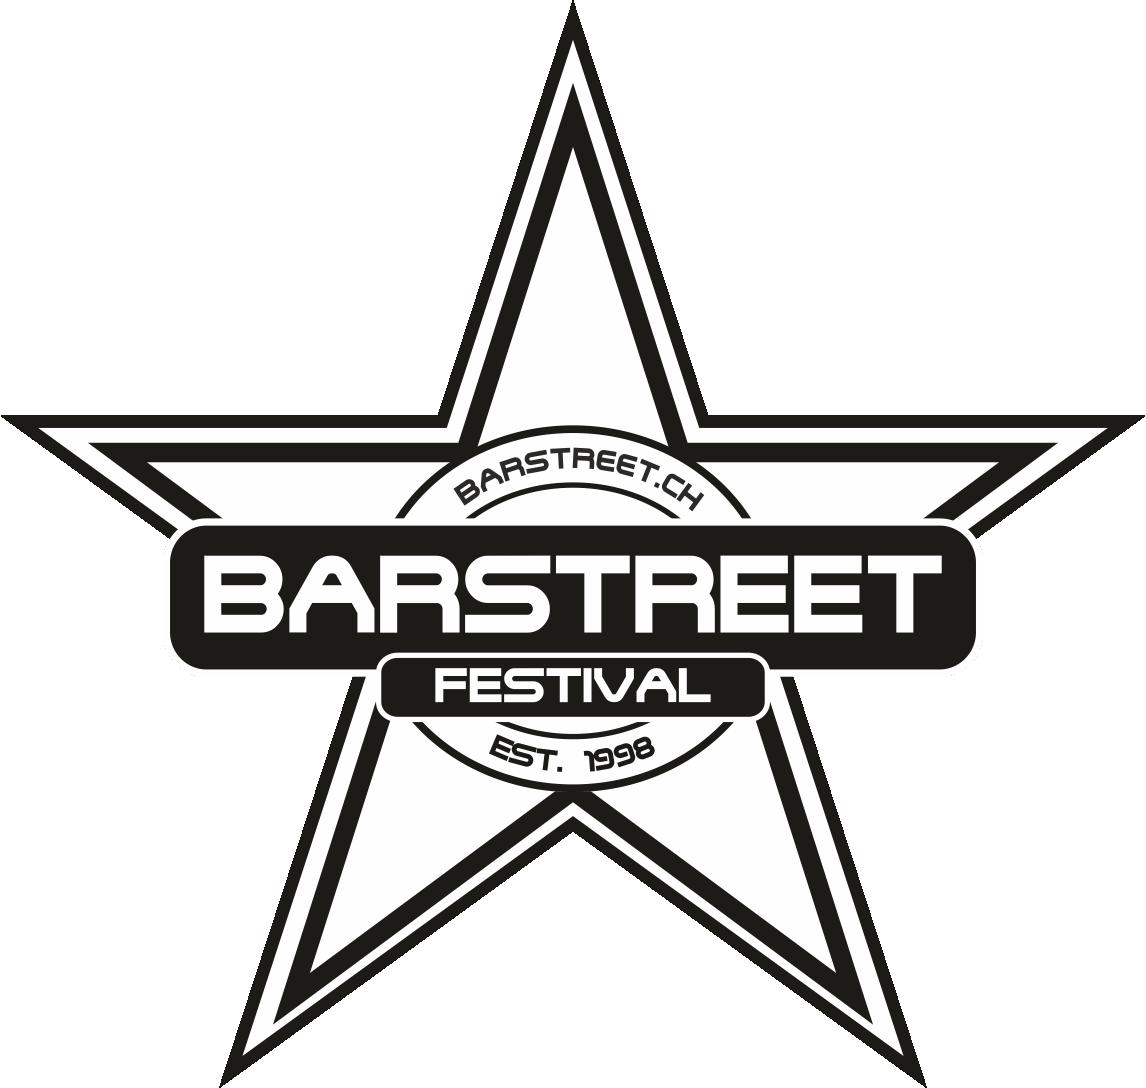 Barstreet-Stern-2015